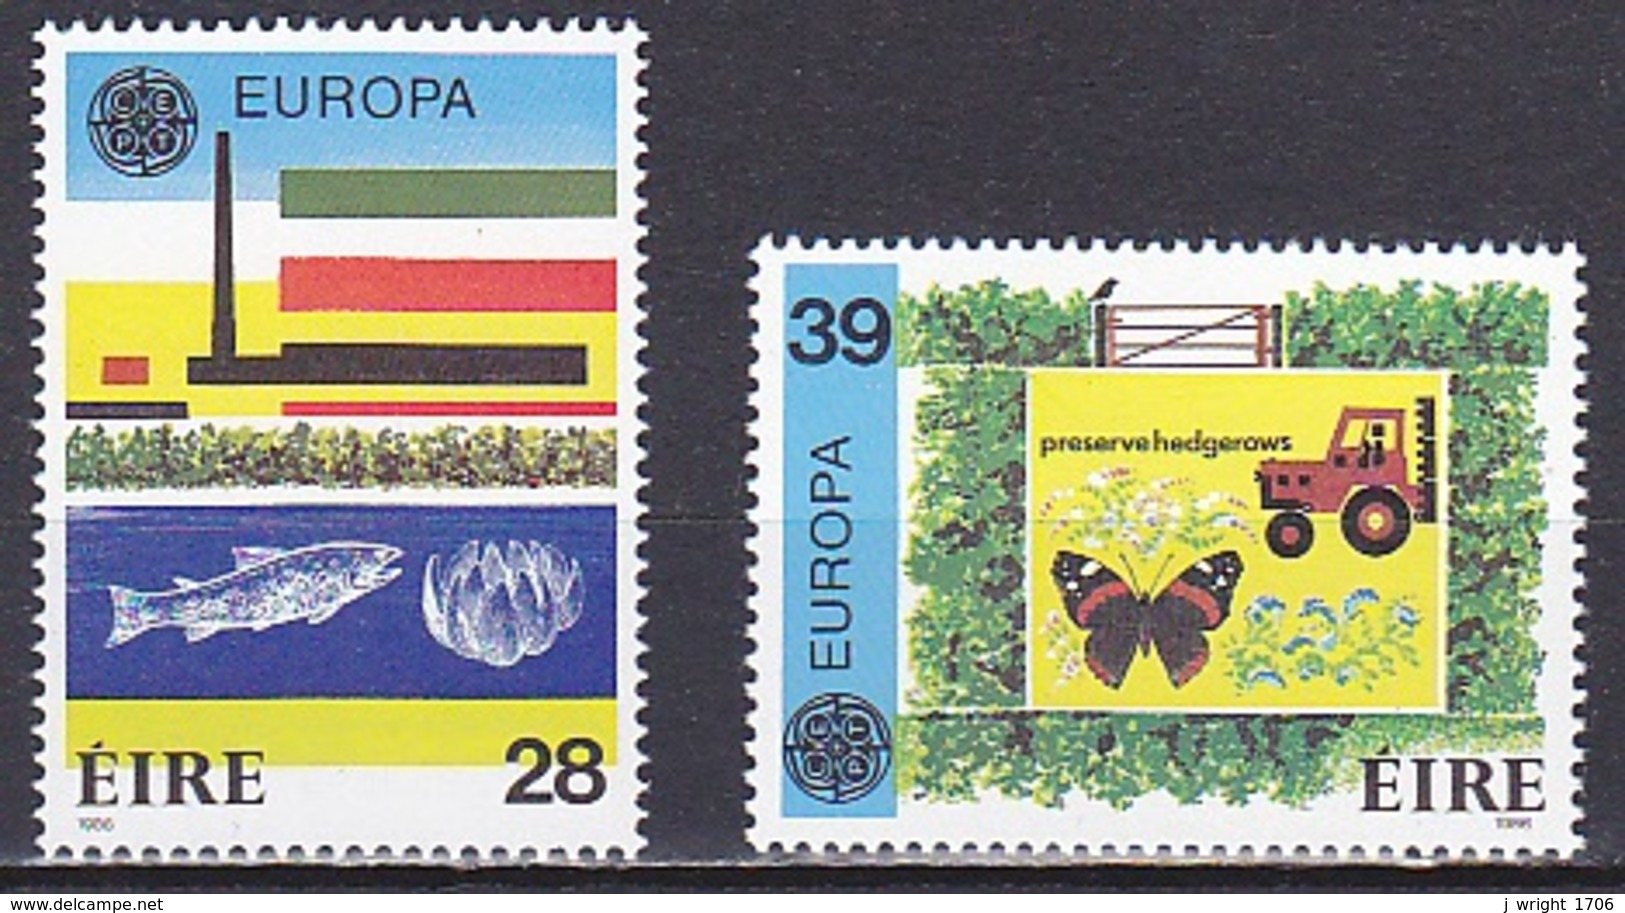 Ireland/1986 - Europa CEPT - Set - MNH - 1949-... Republic Of Ireland